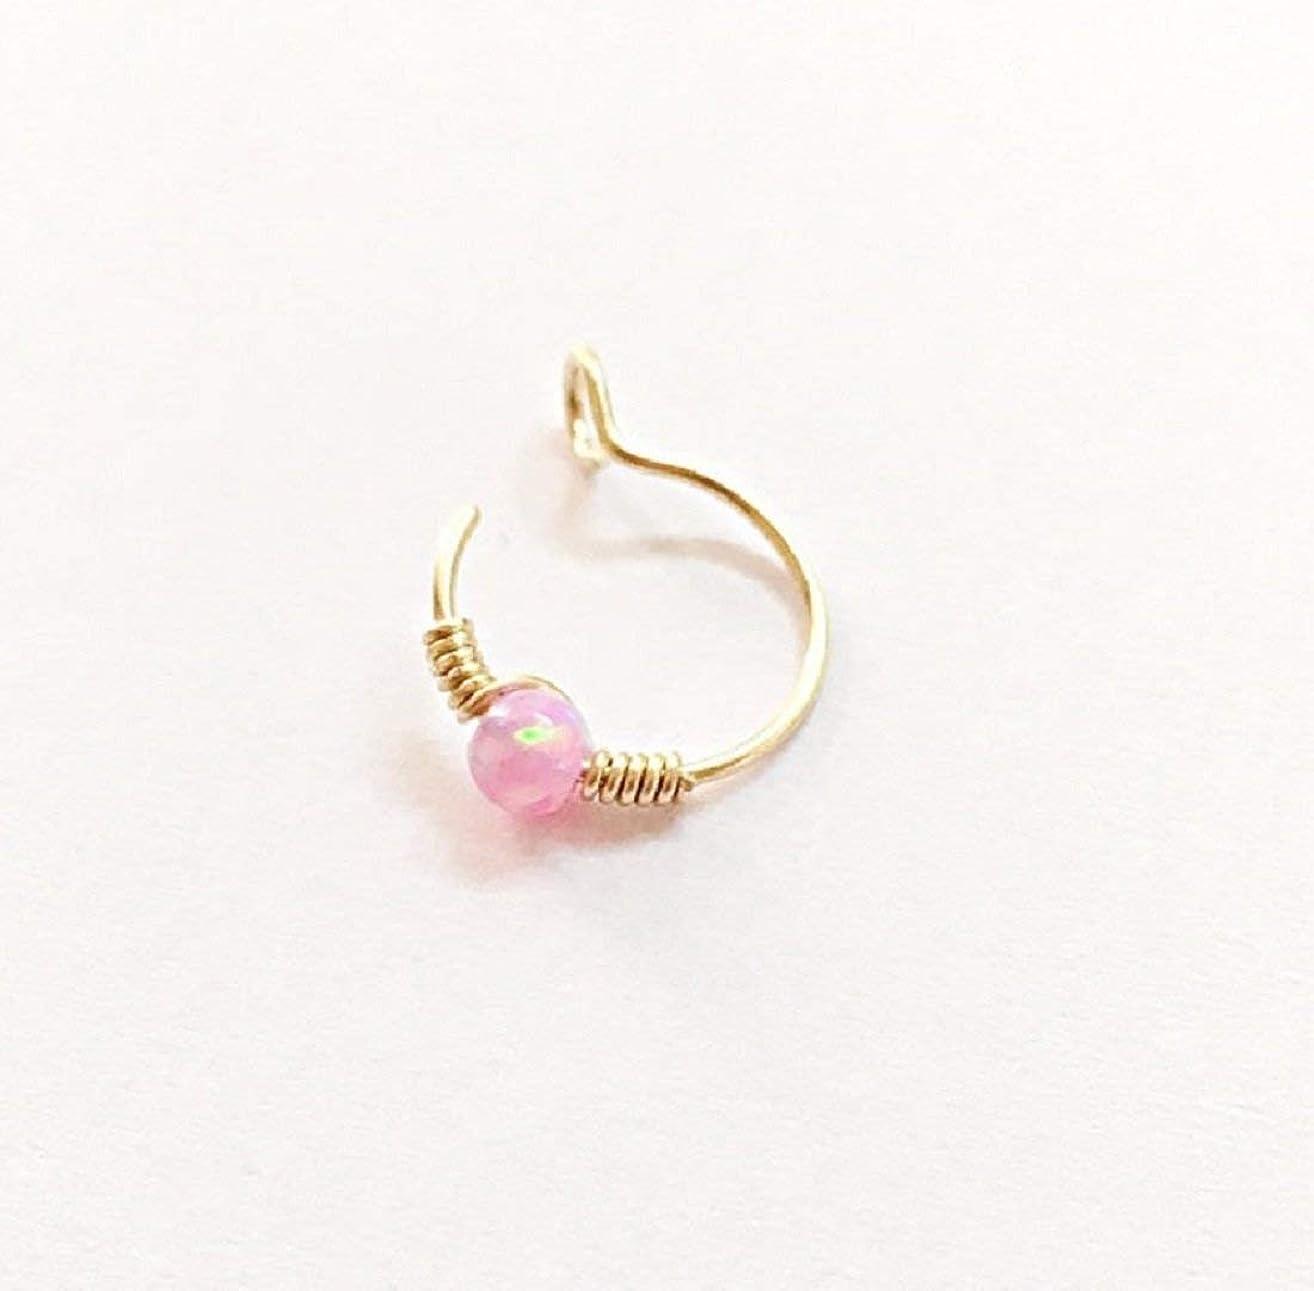 9K Yellow/Rose Gold Fake Nose Ring - Opal Non Pierced Hoop